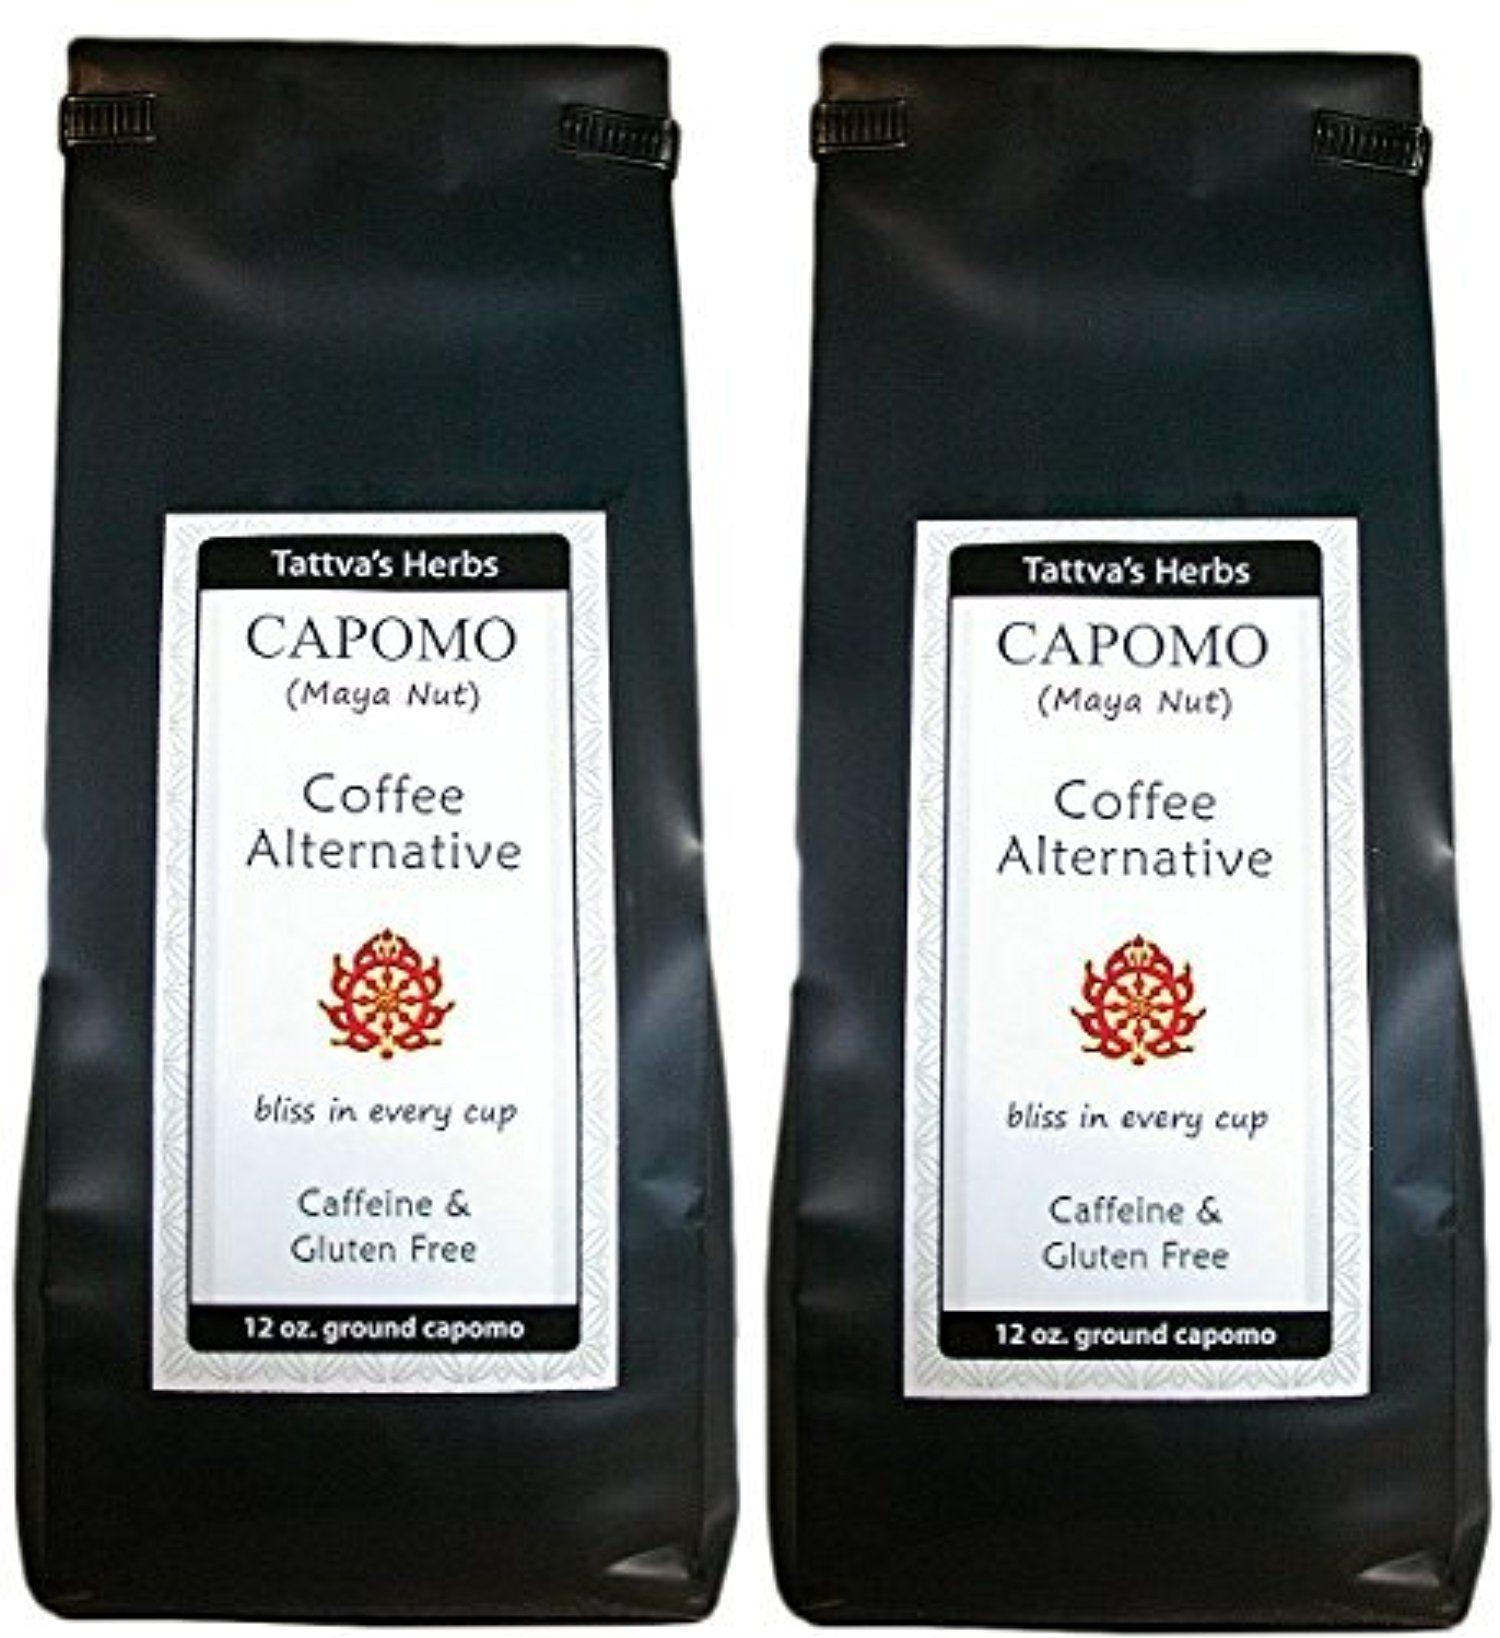 Capomo (Maya Nut) 12oz [2 Pack] Coffee Substitute